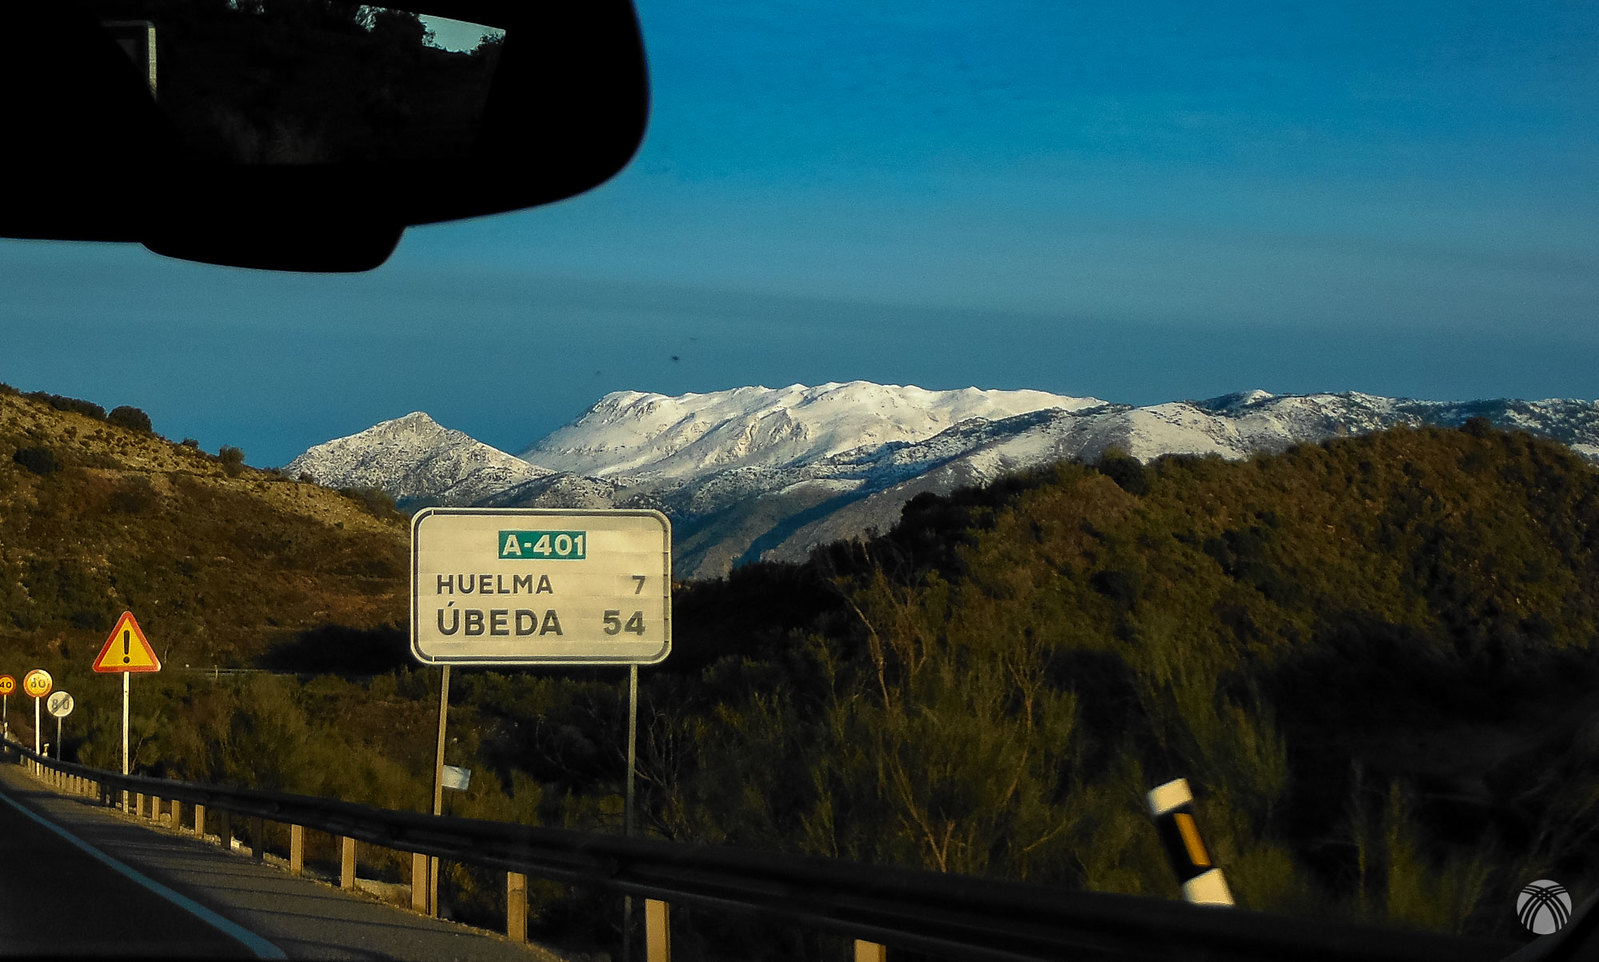 Nos acercamos a Sierra Mágina